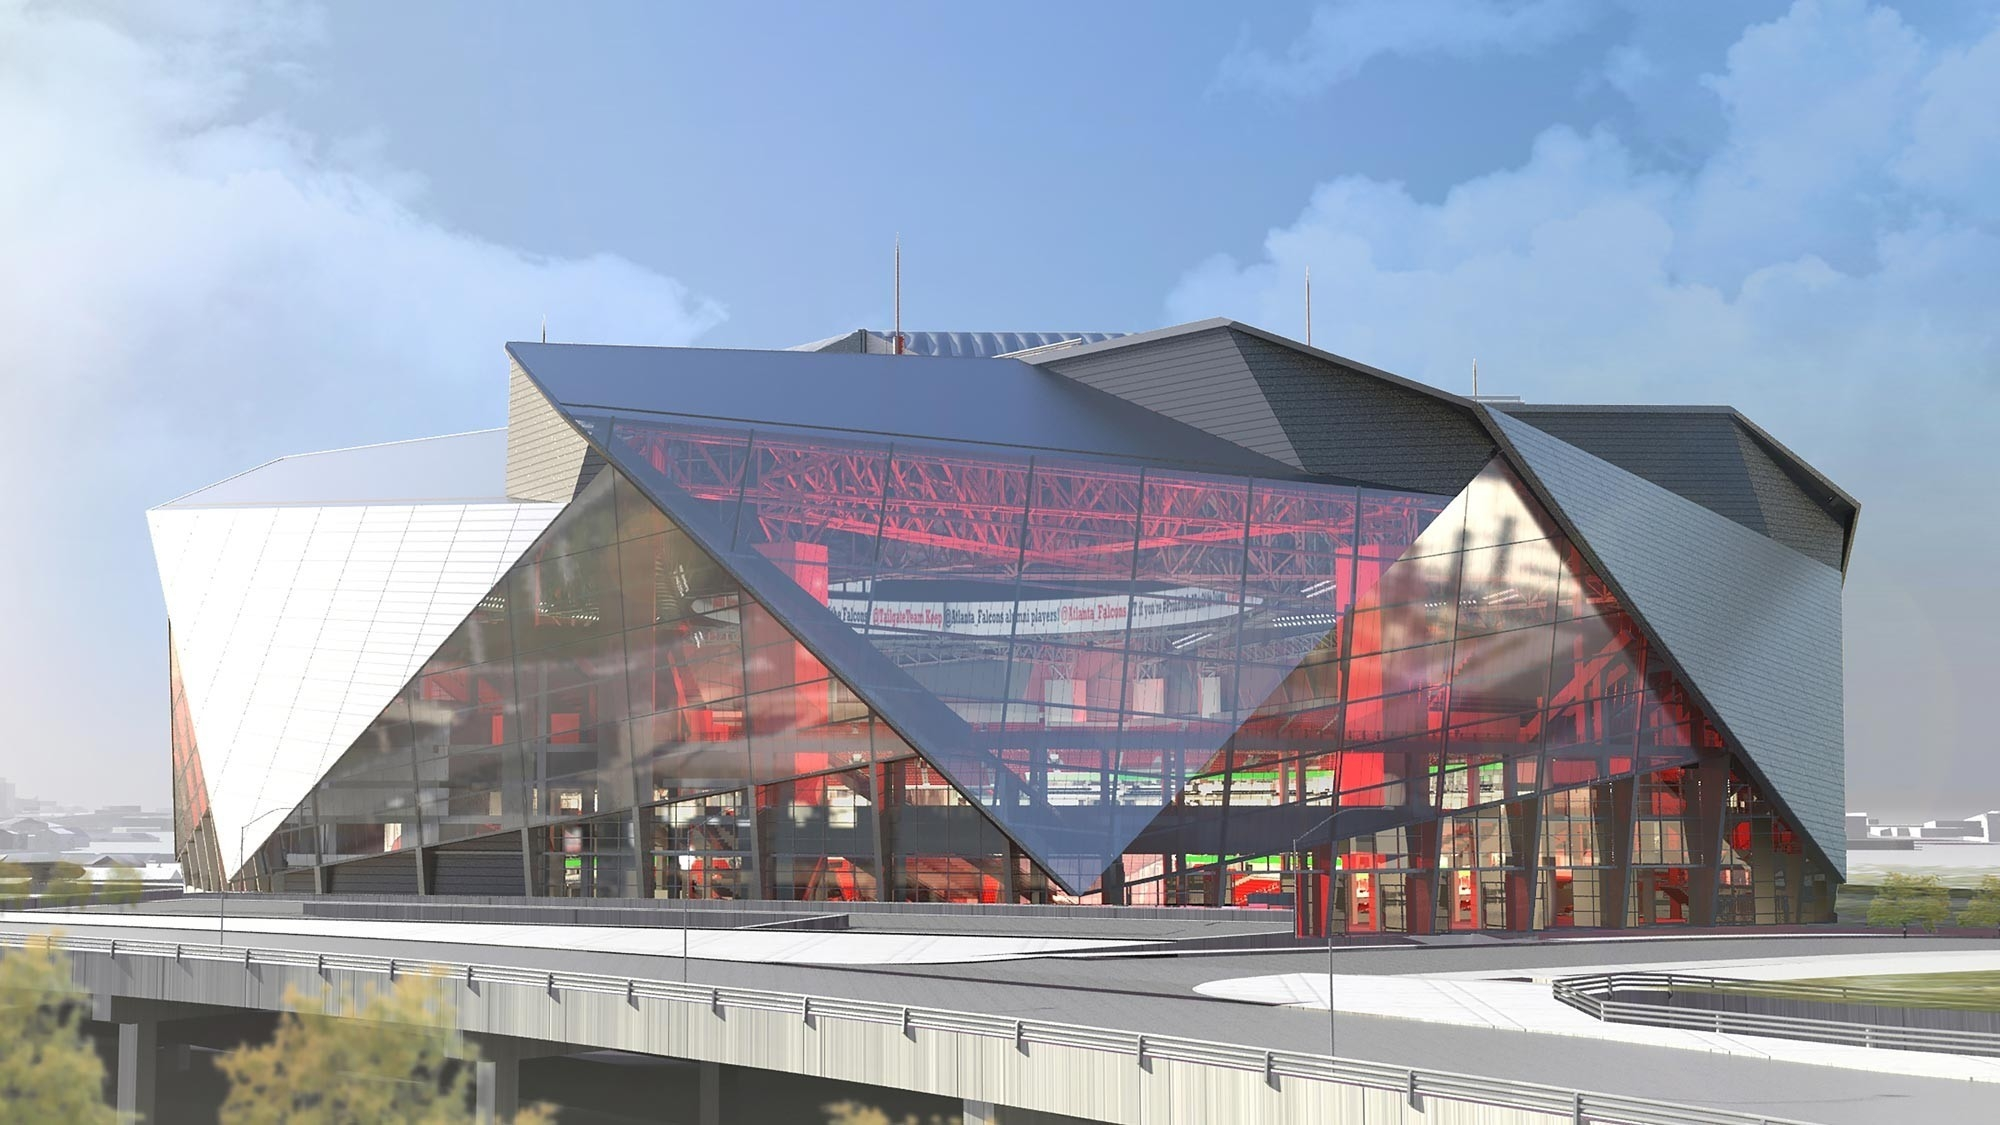 Mercedes Benz Retractable Roof Stadium